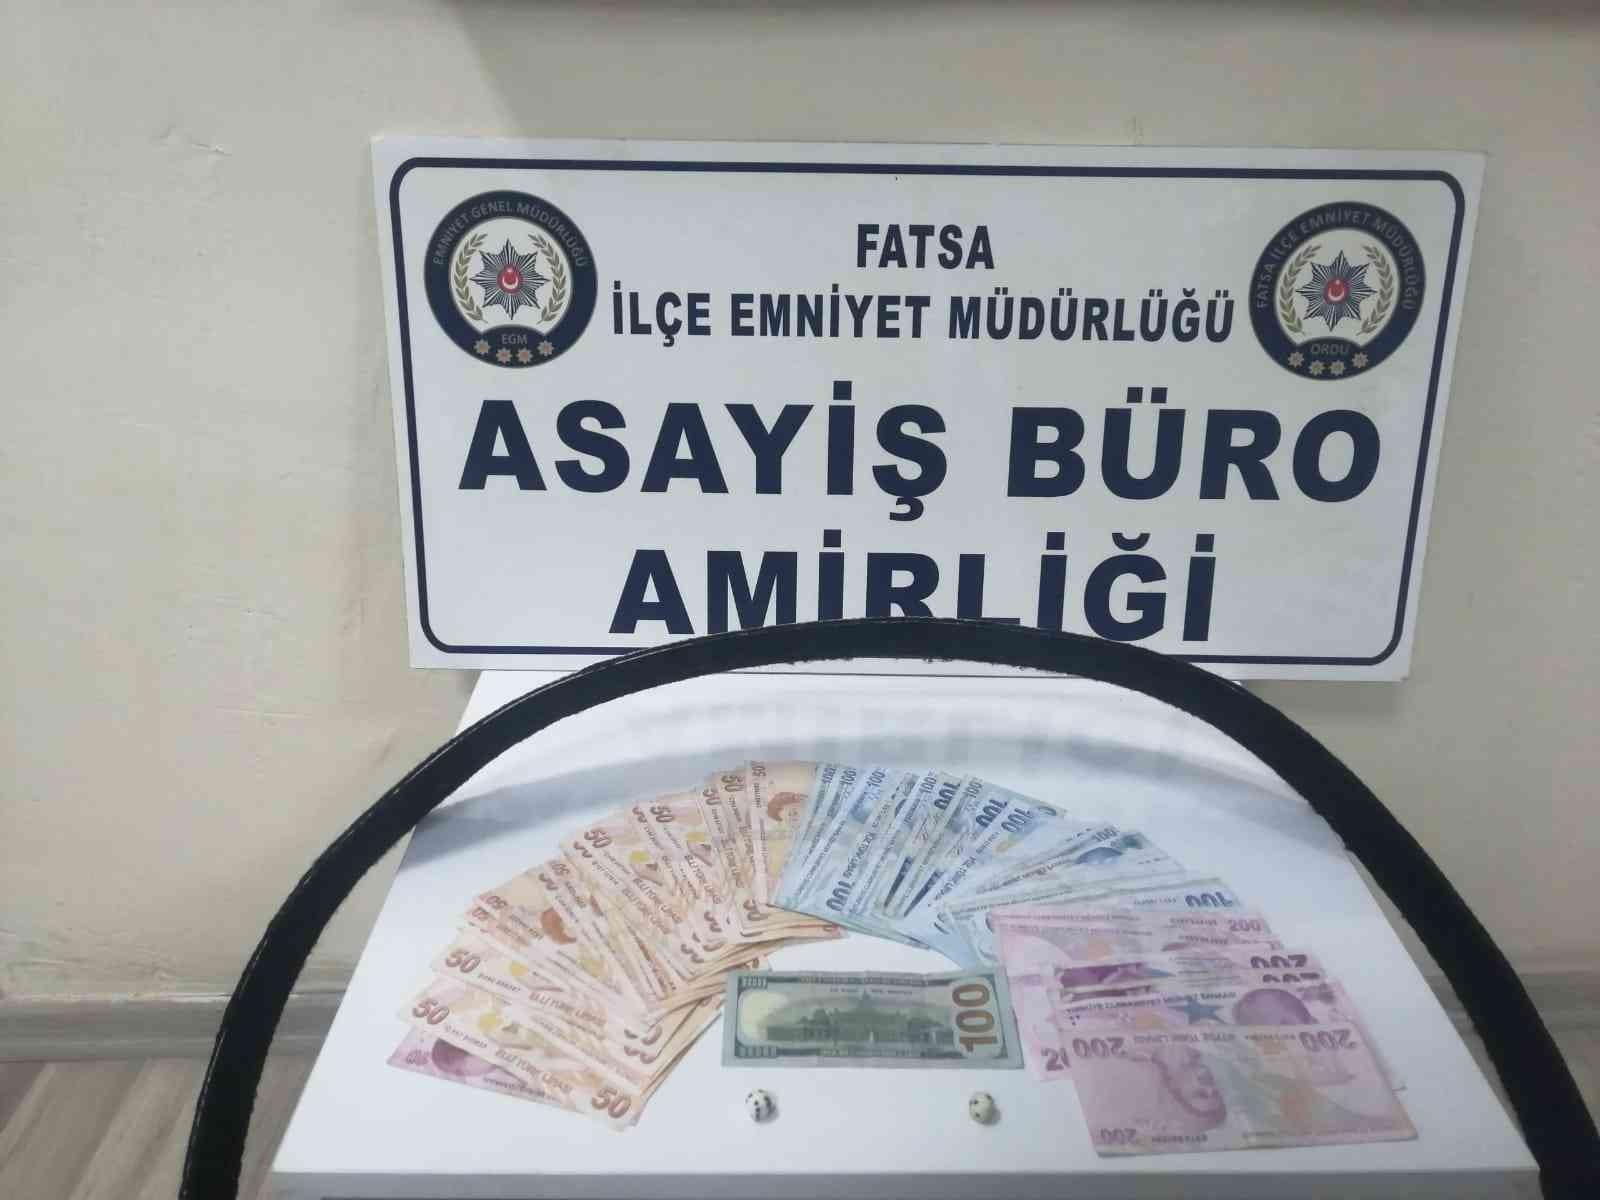 Dolarla kumar oynayanlara suçüstü: 5 şahsa 6 bin 680 TL ceza, bir kişiye adli işlem